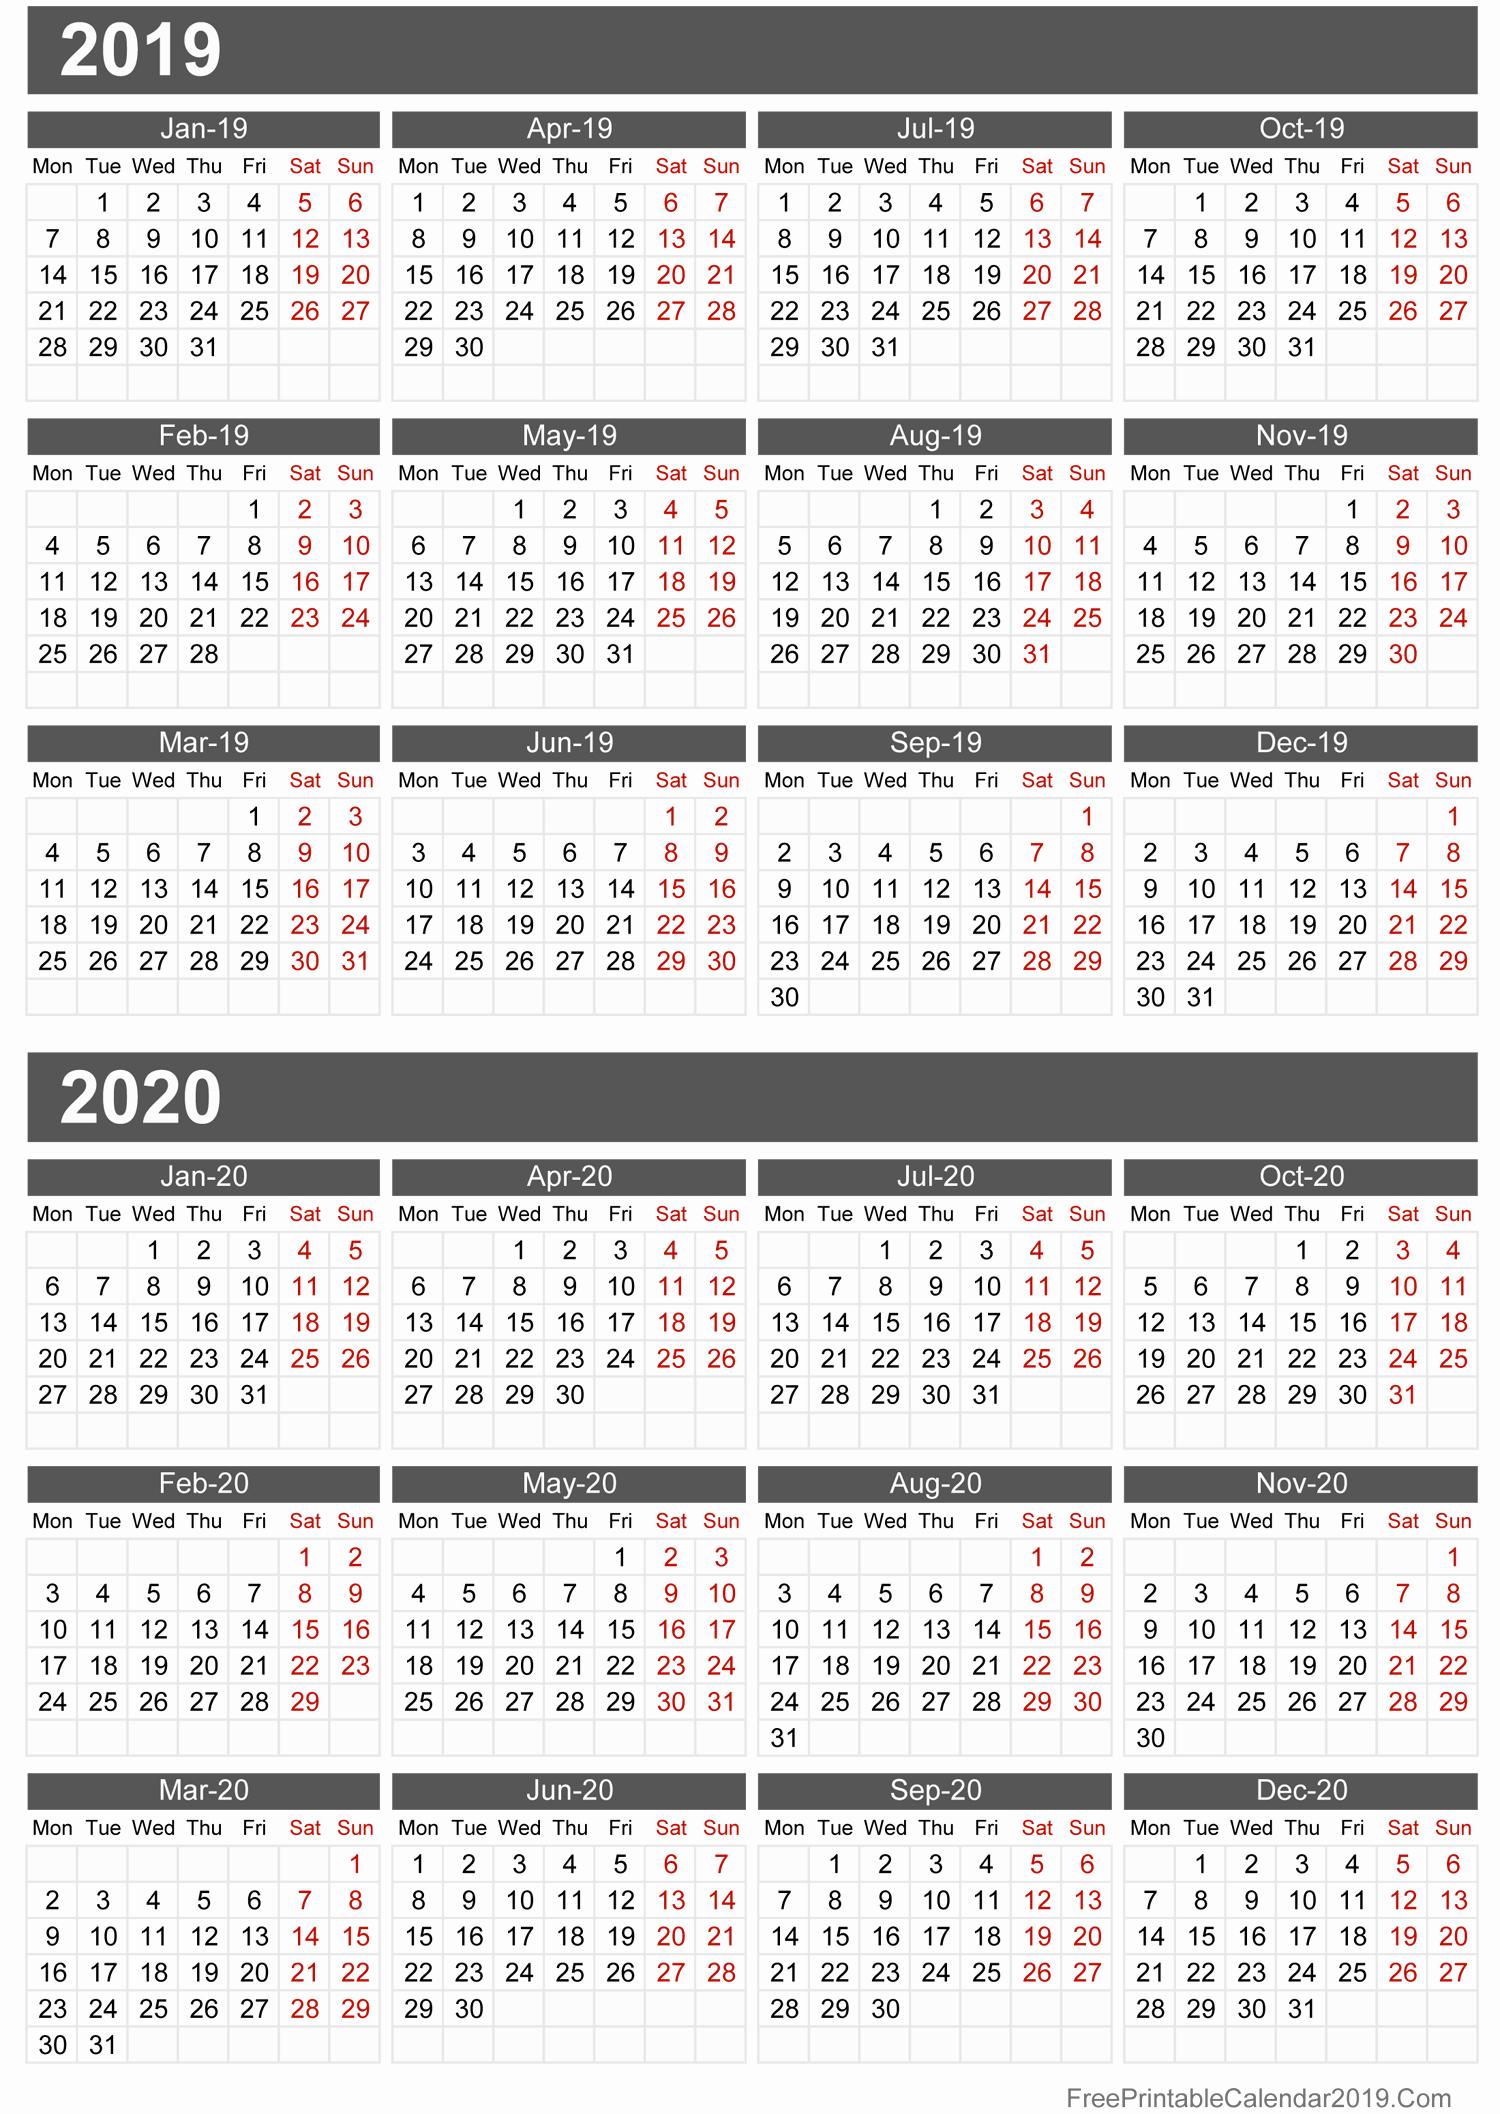 2019 and 2020 Calendar Printable Elegant Free Printable Calendar 2019 with Holidays In Word Excel Pdf